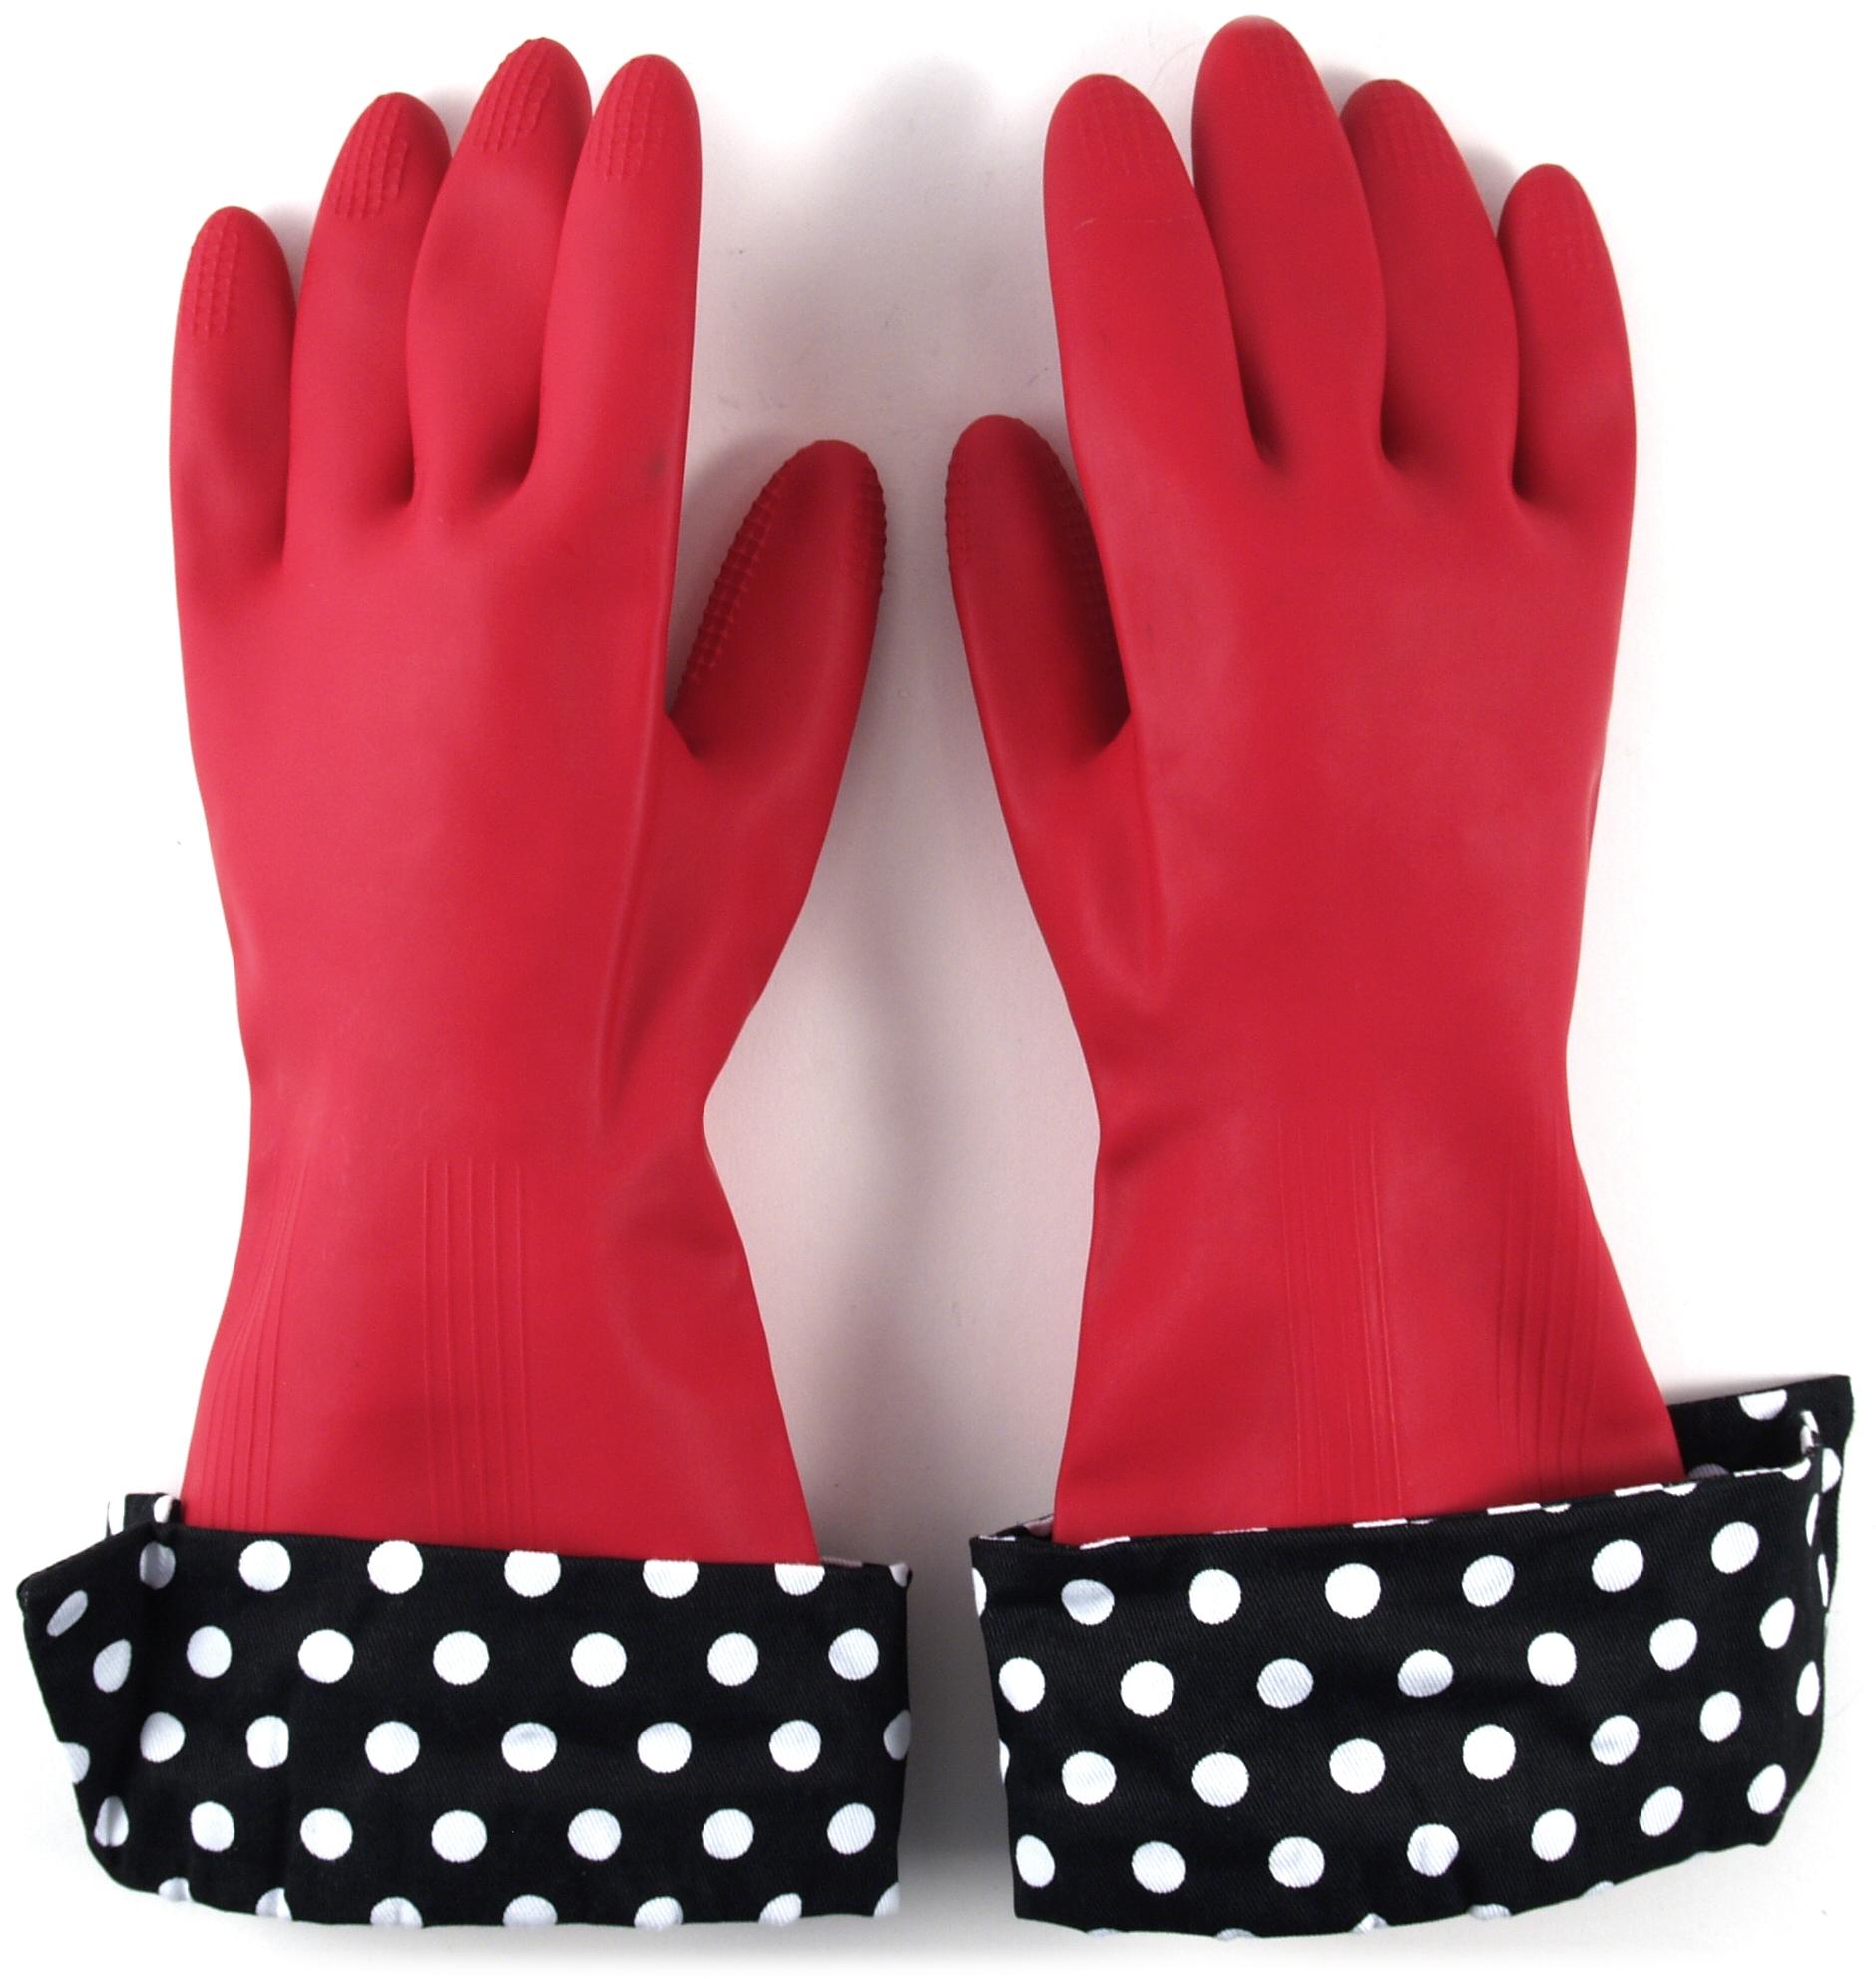 Julie's Signature Latex Gloves with Designer Cuffs, 2 Pairs